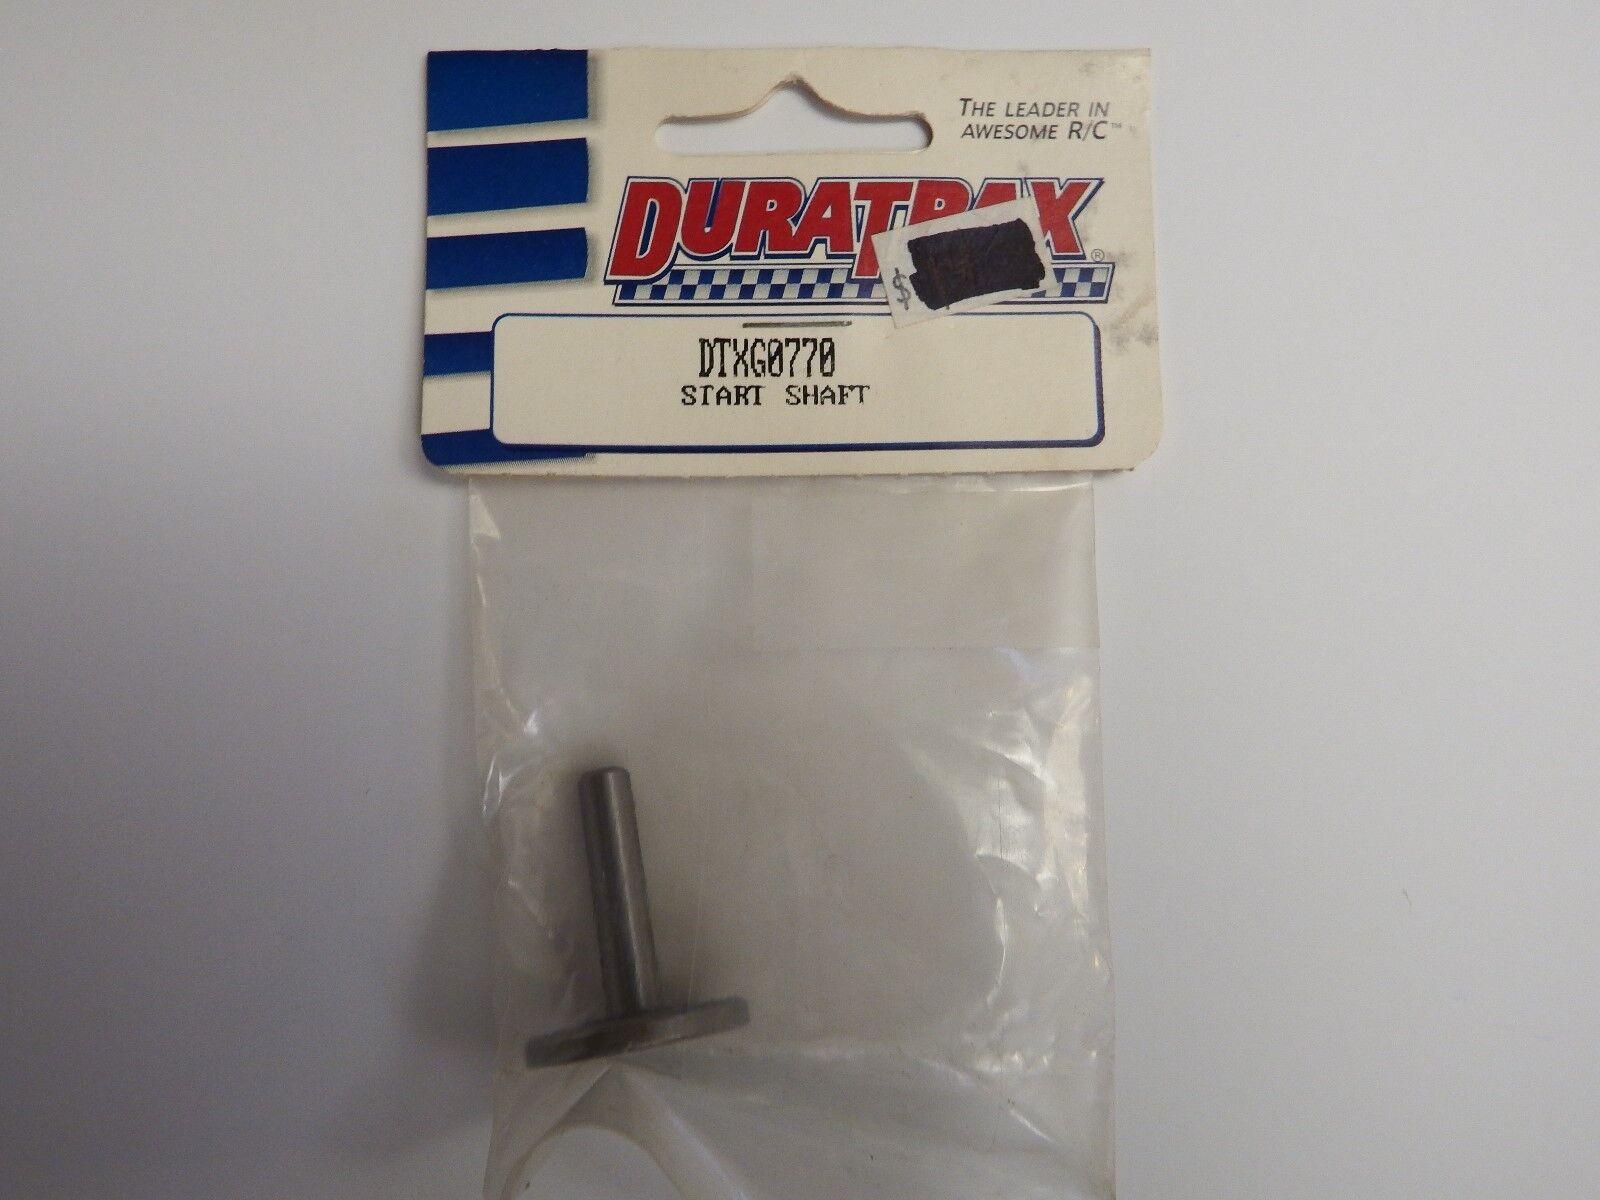 Duratrax DTXC0762 Start Shaft